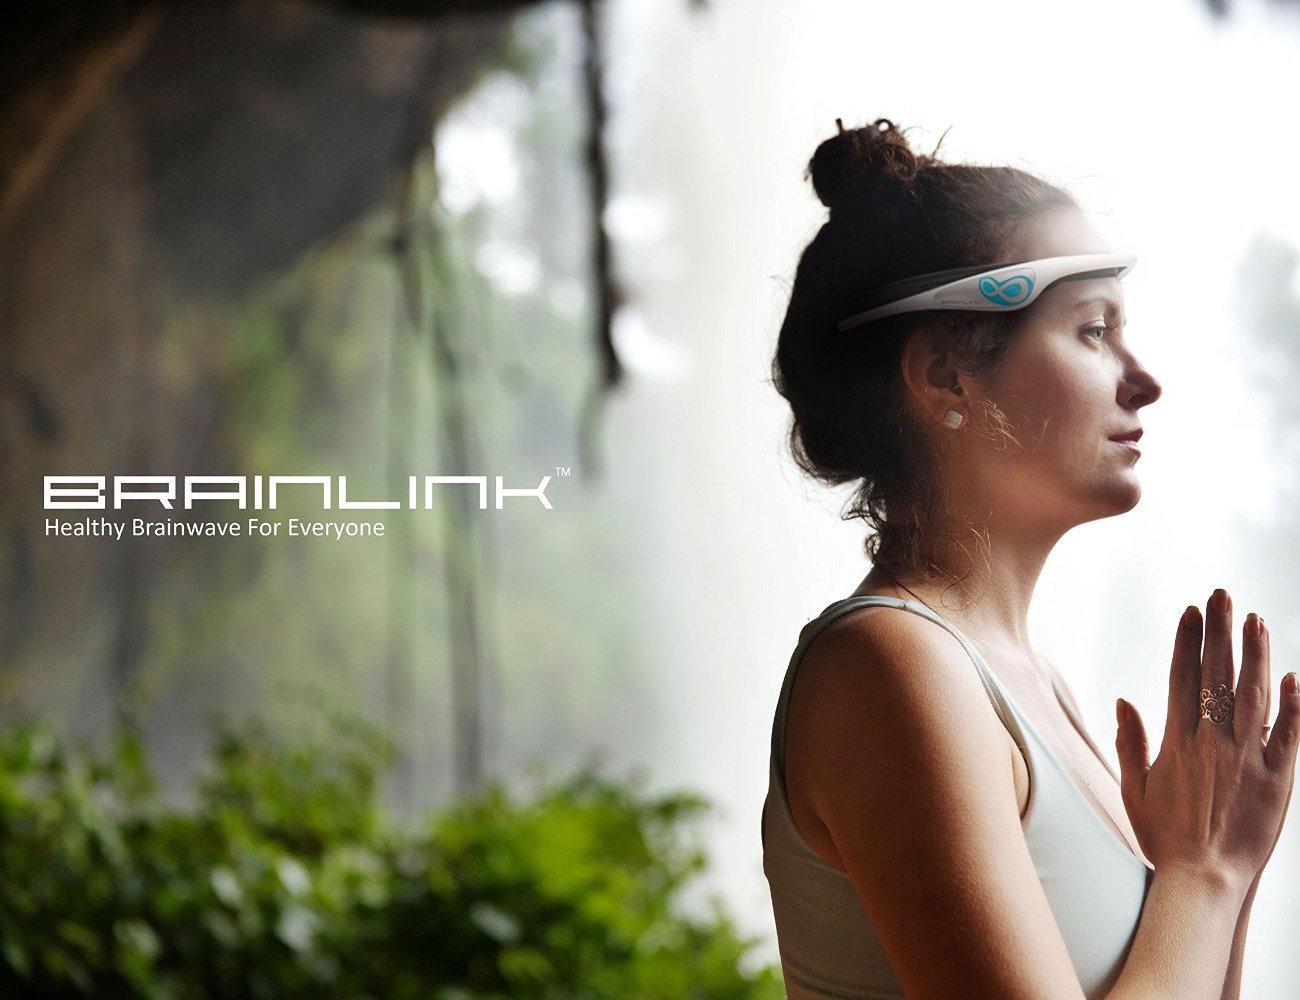 brainlink-portable-headset-04